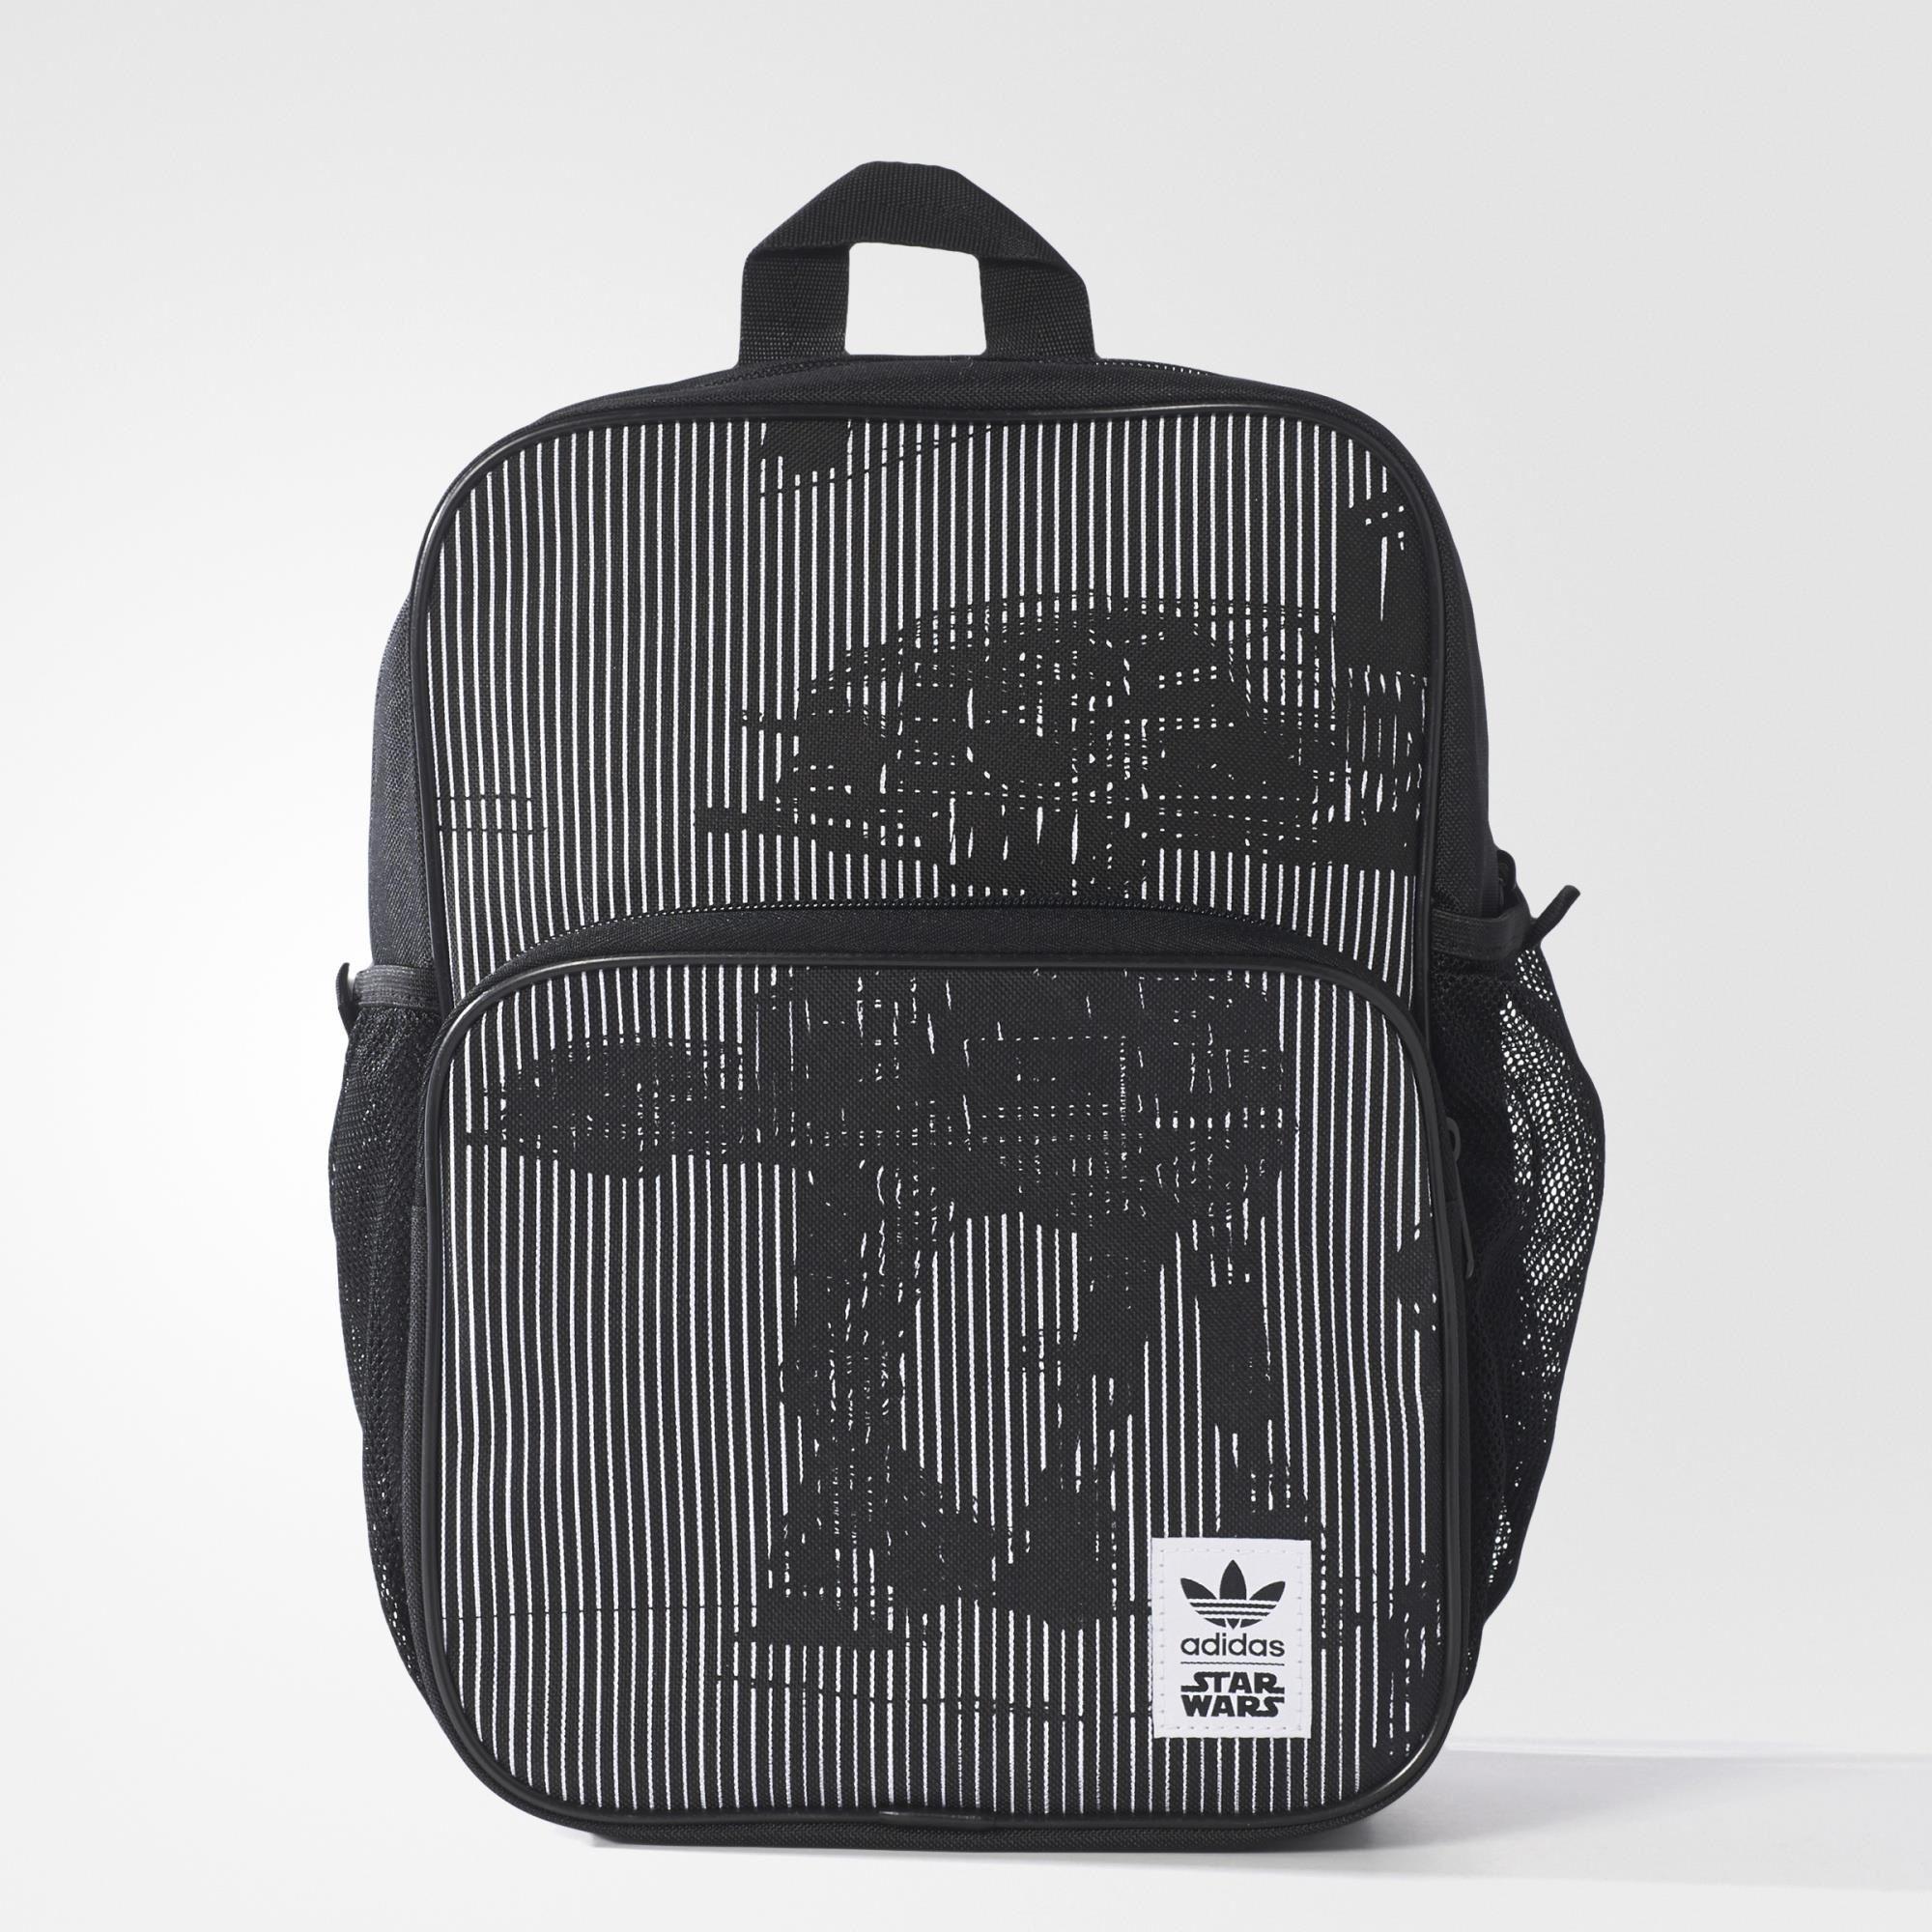 3a1e868e7d adidas Star Wars Backpack Çocuk Sırt Çantası  AB2922 - Barcin.com